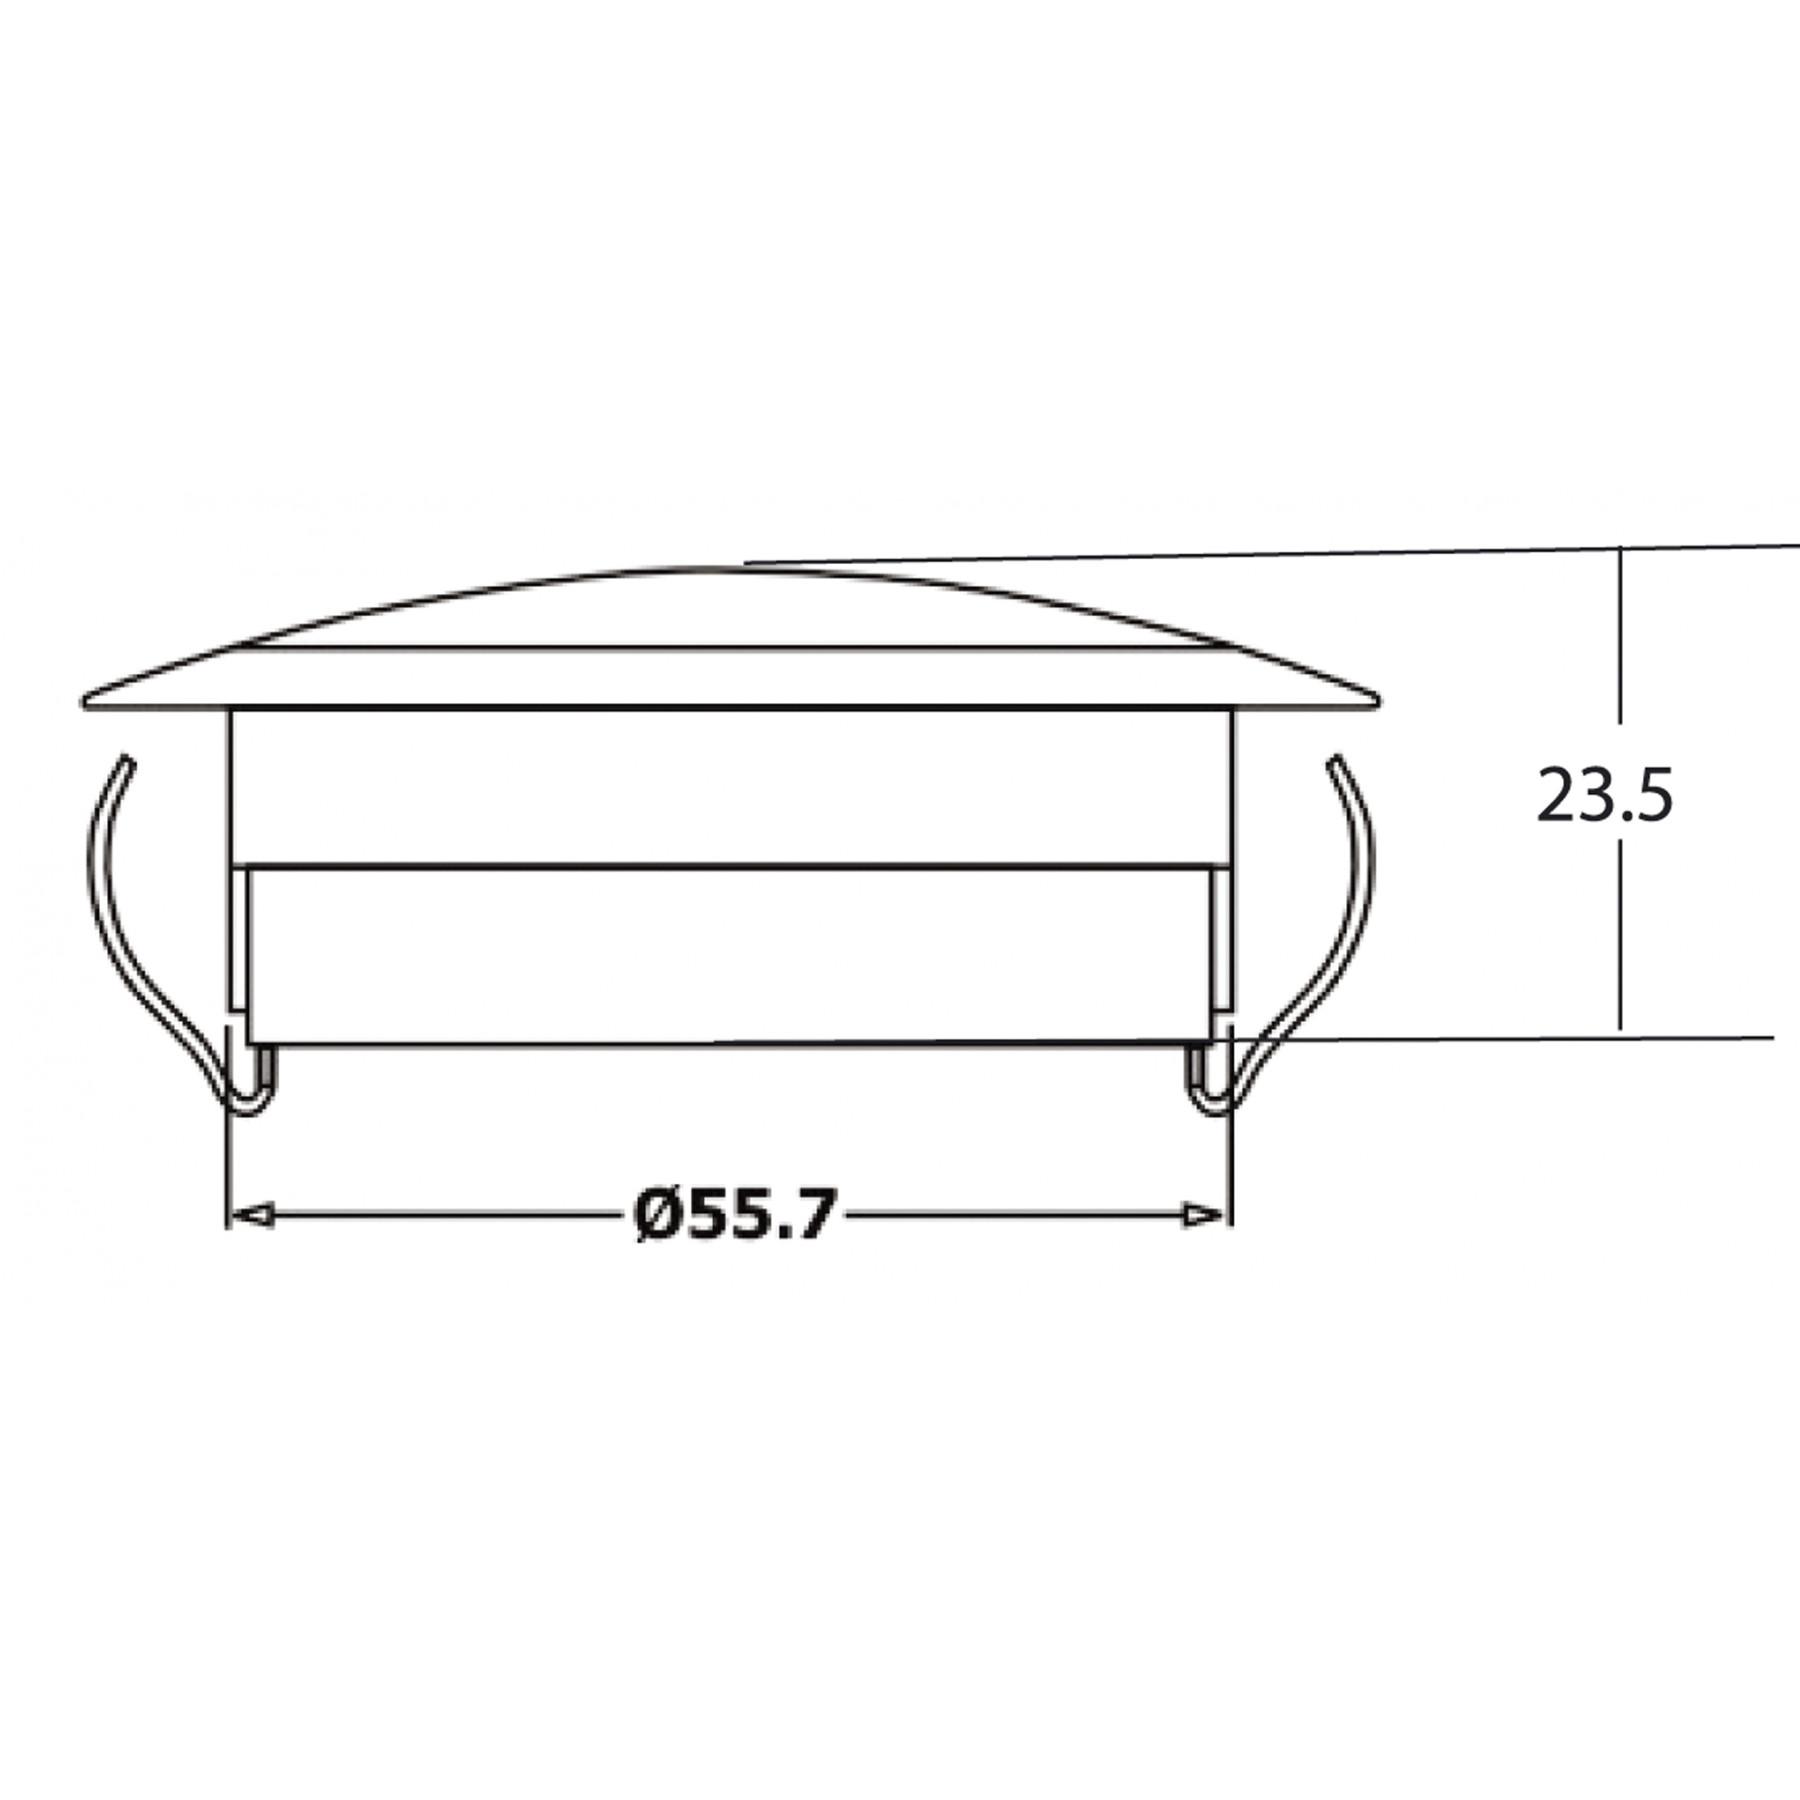 Interieurlamp LED oranje Ø 55mm 24v